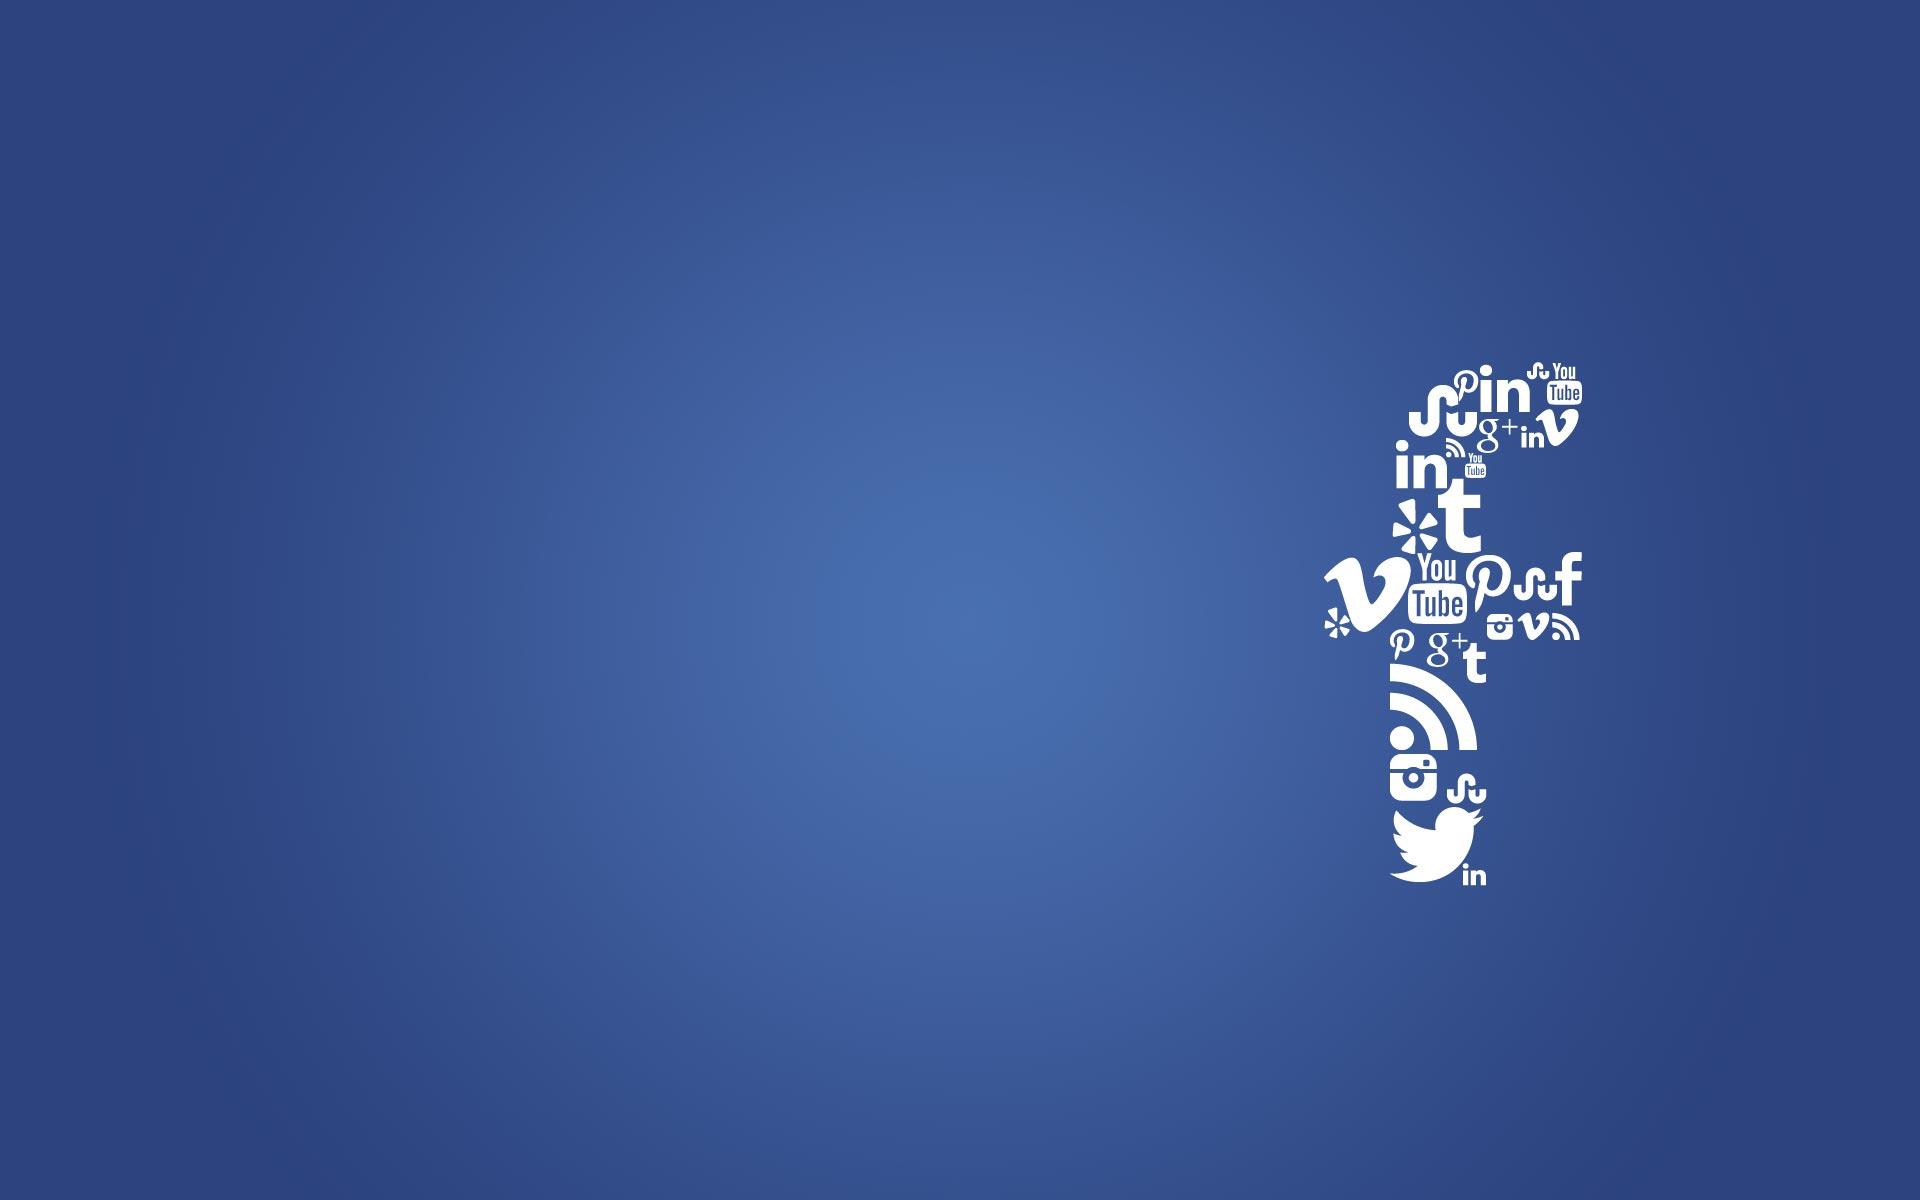 Facebook Hd Wallpaper   Graphic Design 36829   HD Wallpaper 1920x1200